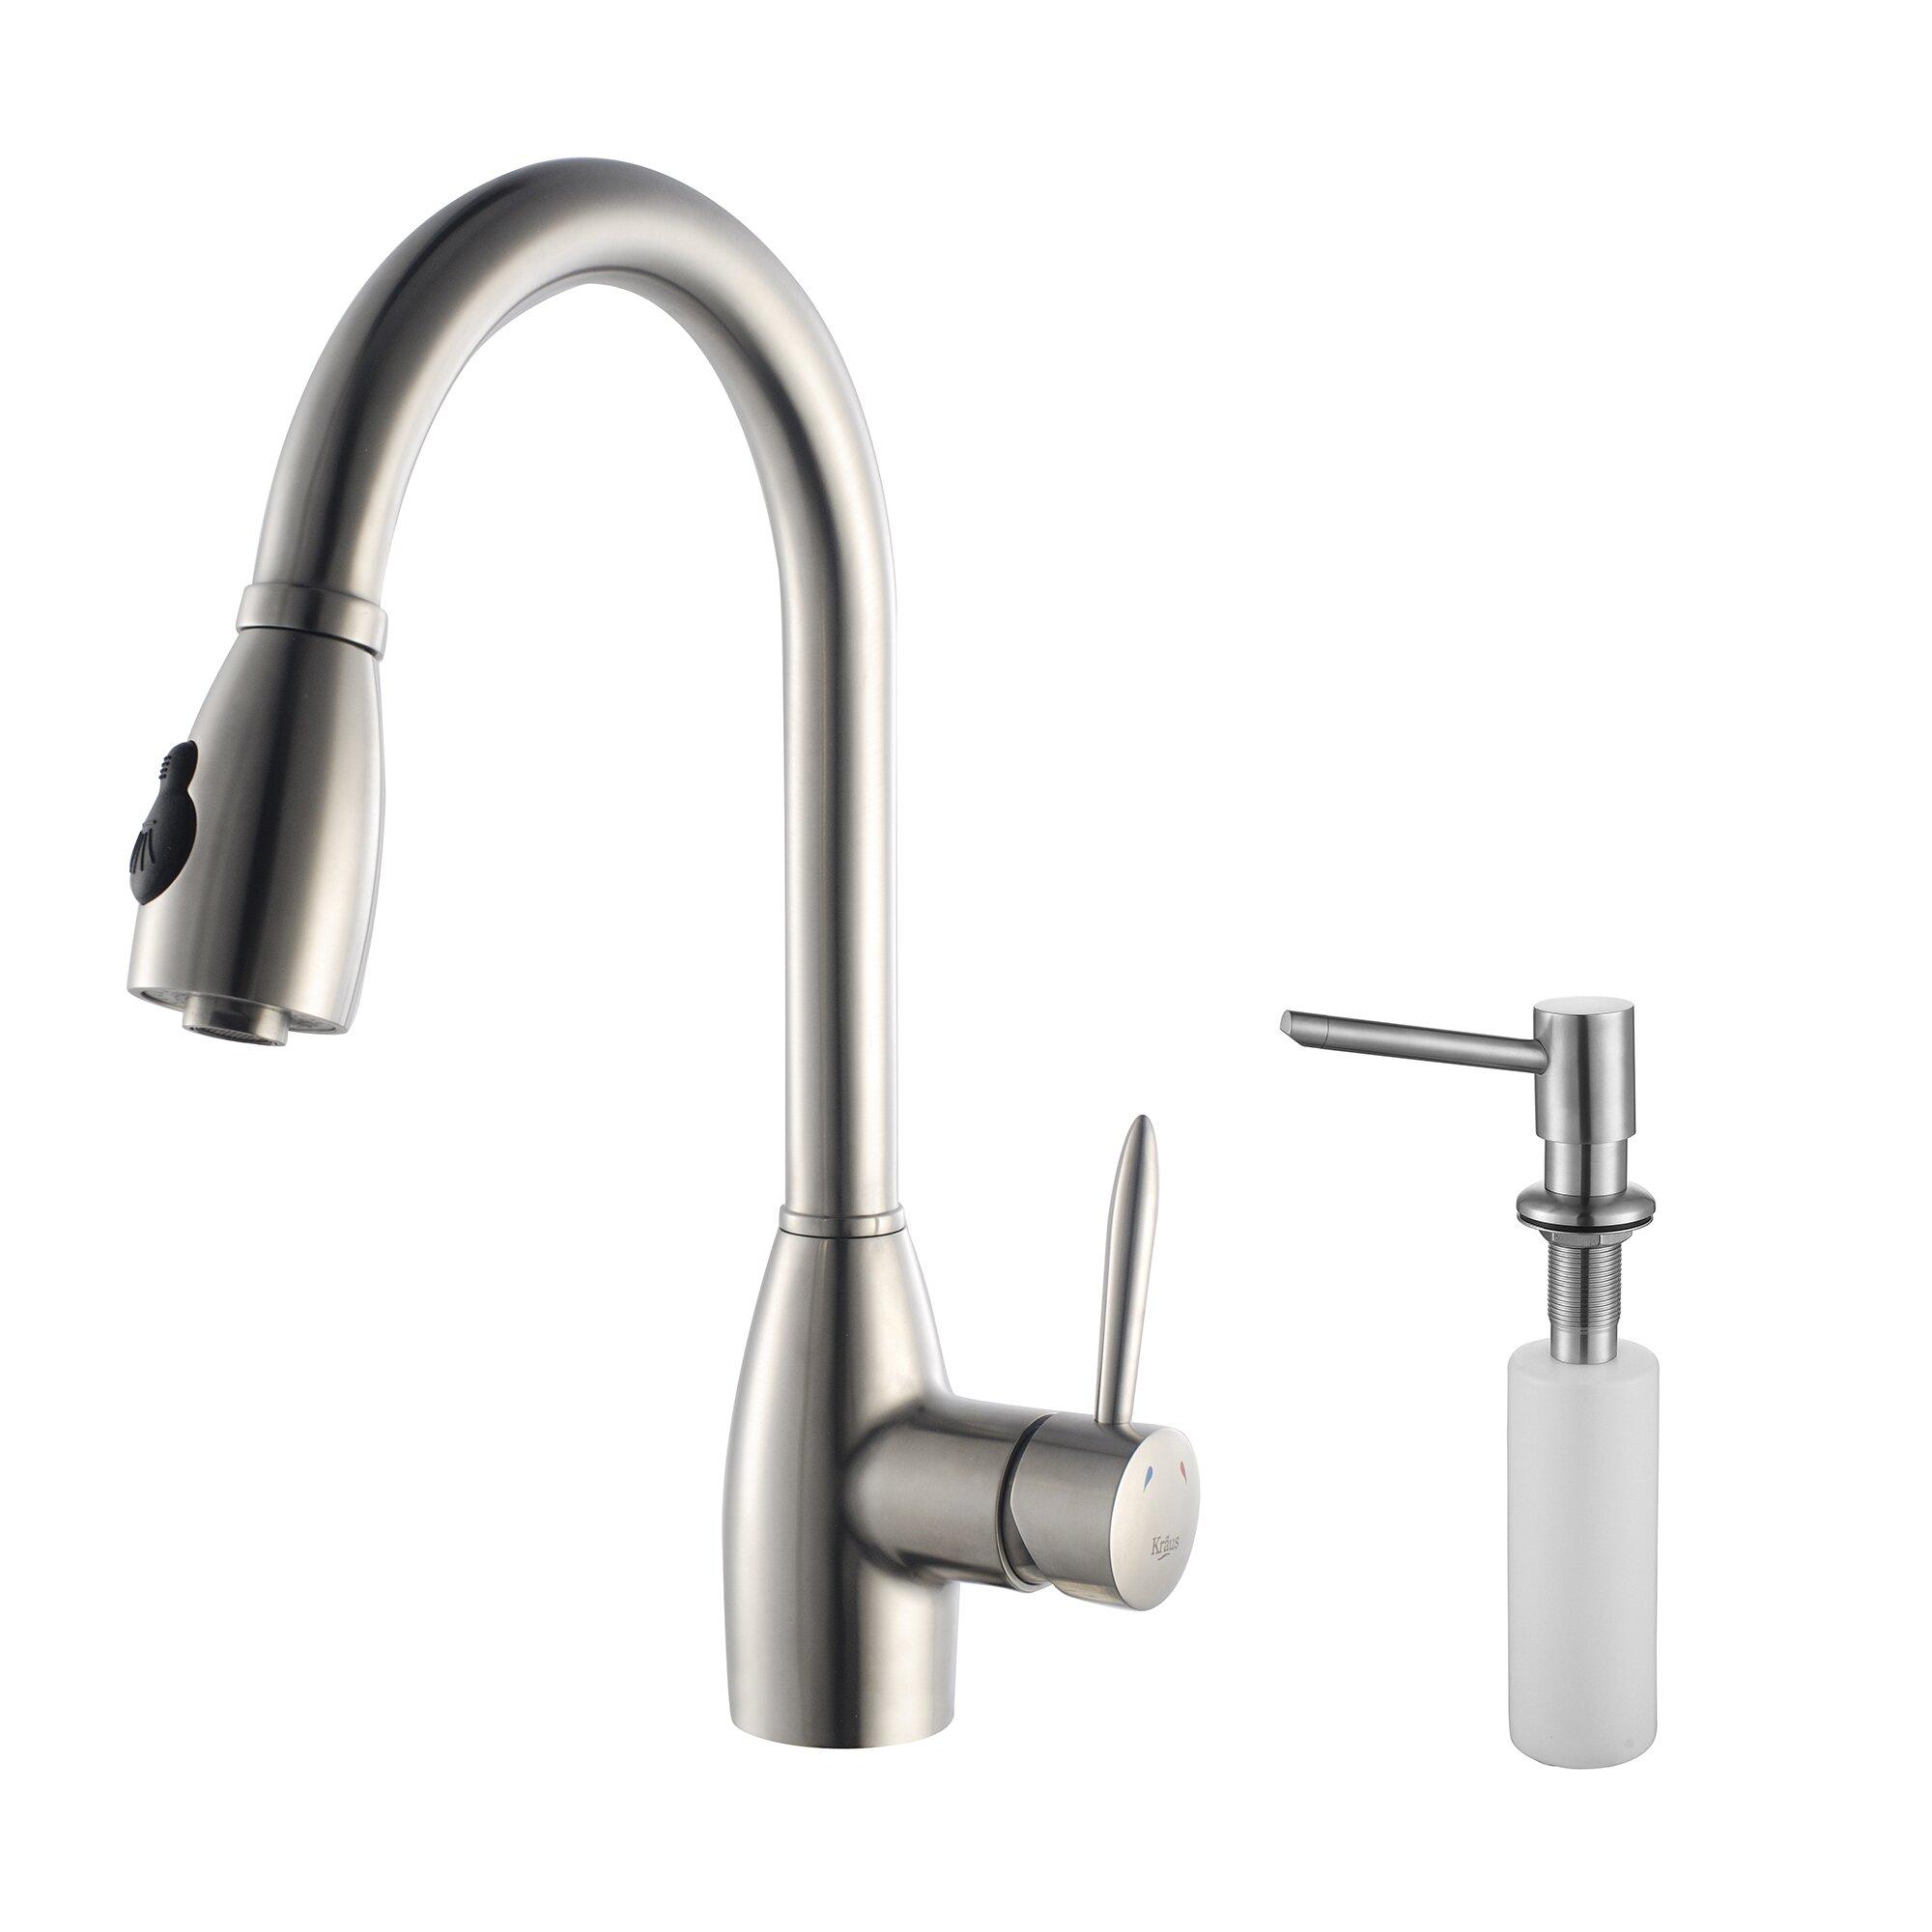 kraus single handle single hole kitchen faucet amp reviews kraus mateo single lever pull down kitchen faucet